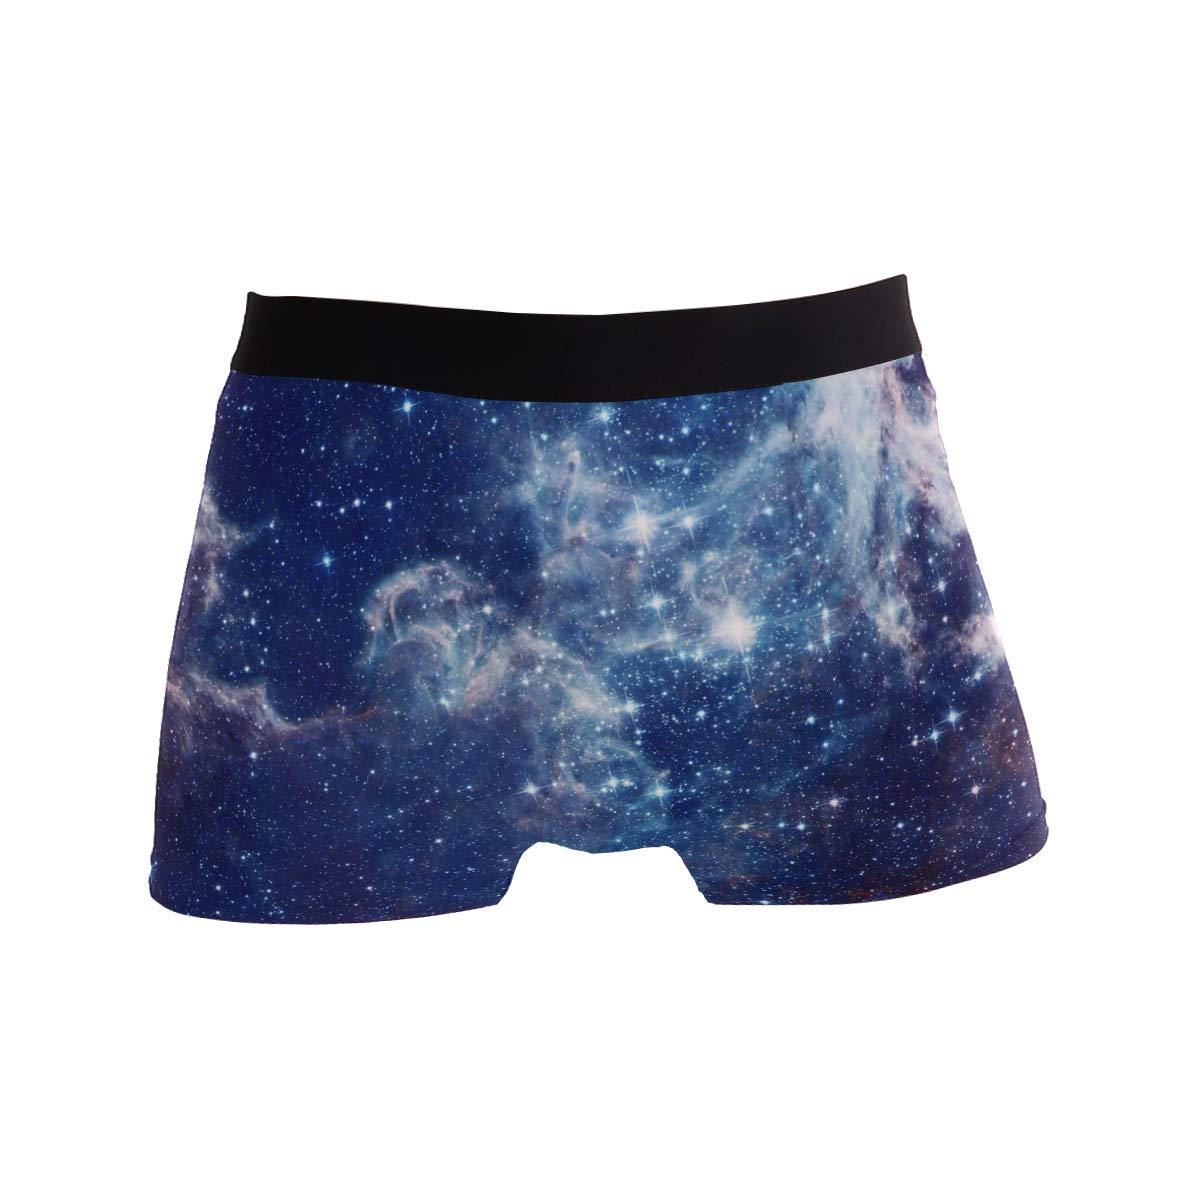 BETTKEN Mens Boxer Briefs Galaxy Nebula Deep Space Short Underwear Soft Stretch Underpants for Men Boys S-XL